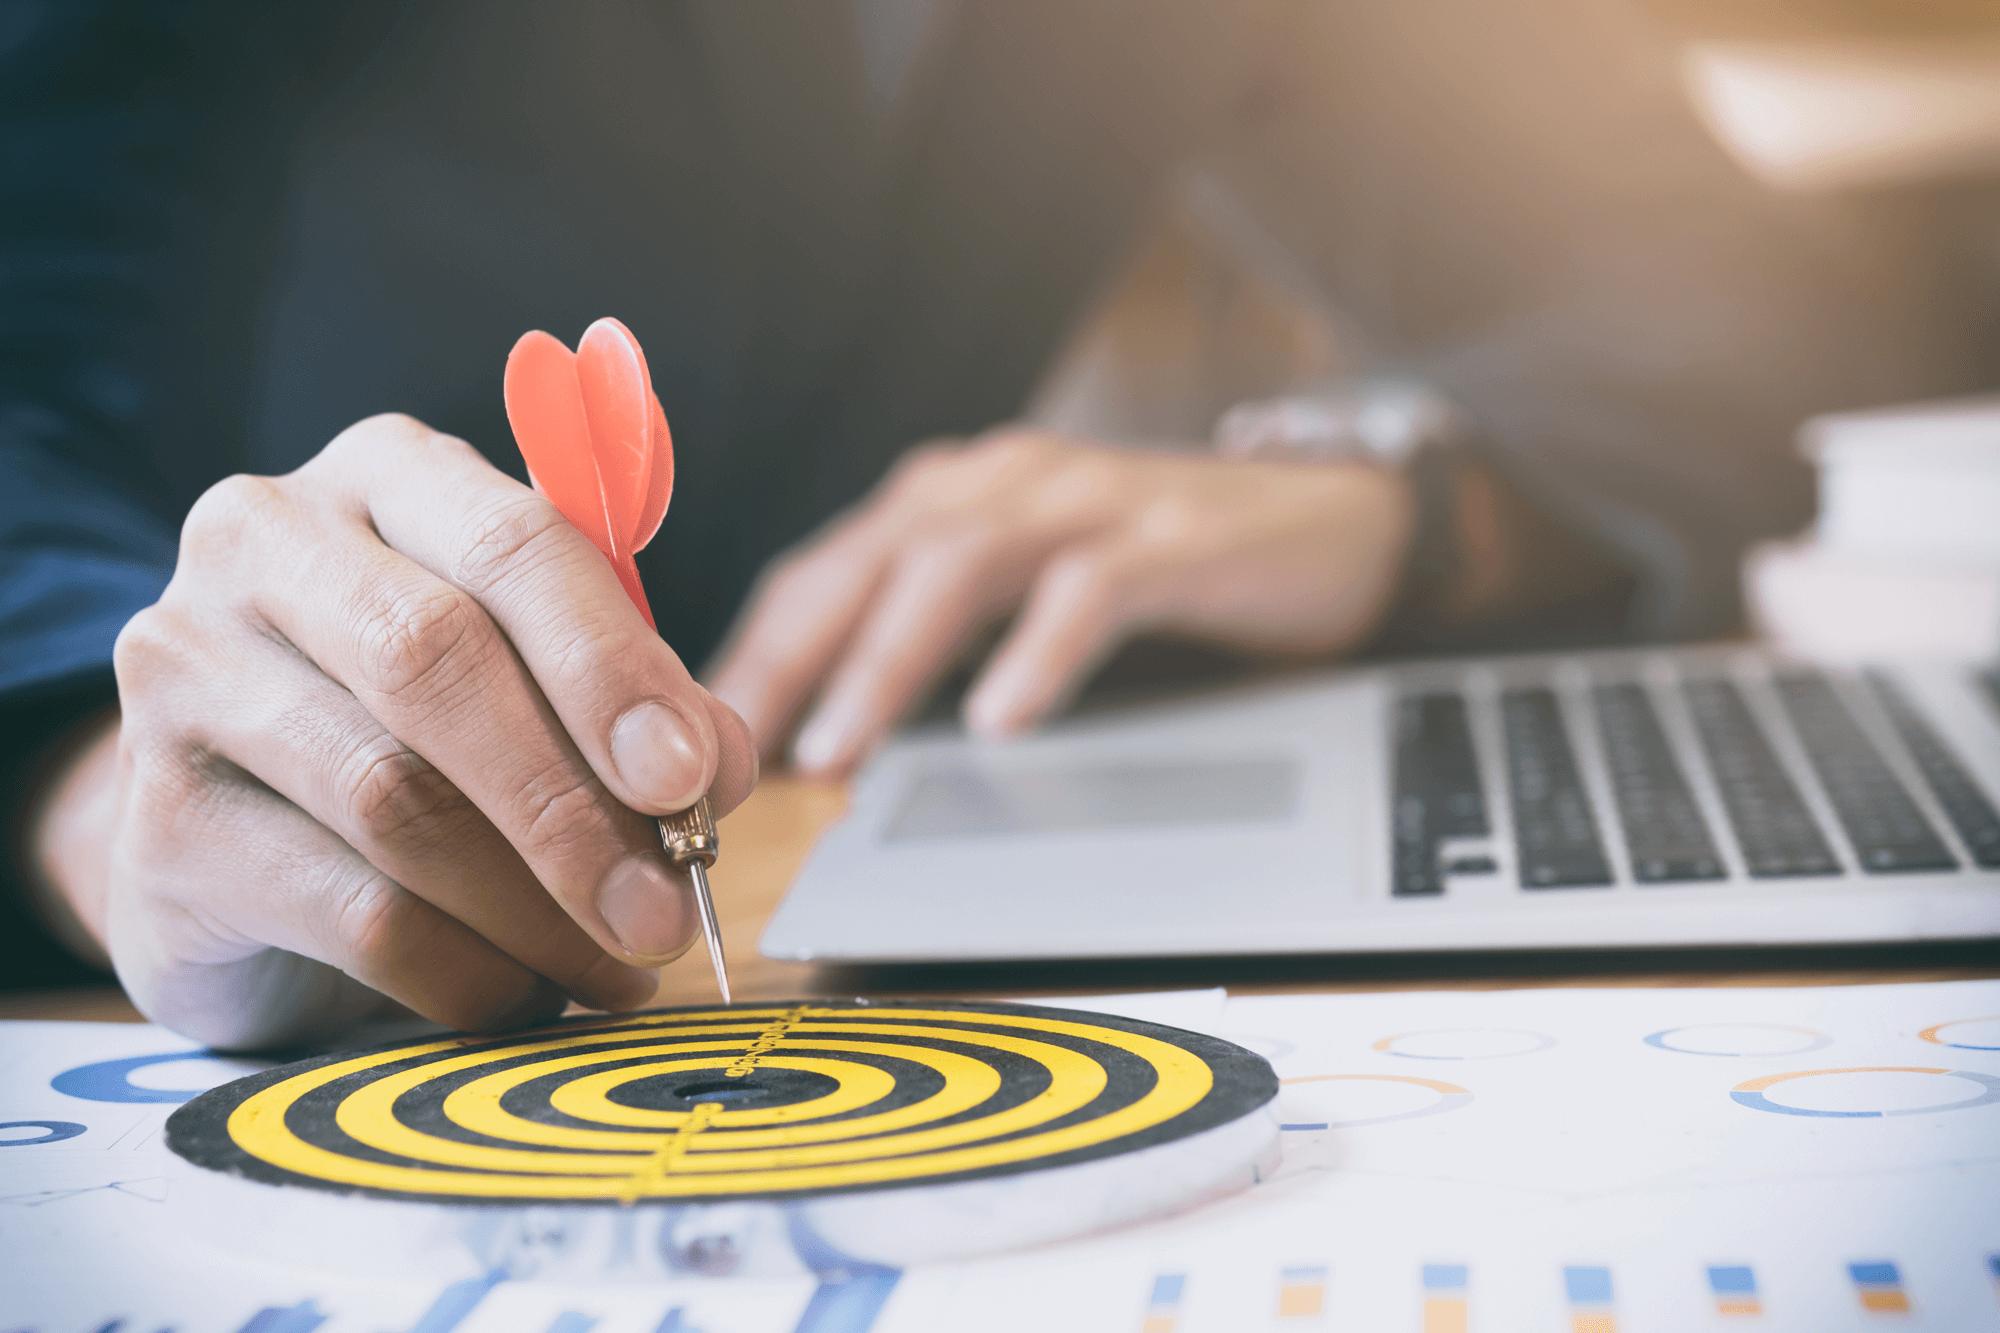 Missie Visie Strategie | Andersom denken | Visie Missie Strategie